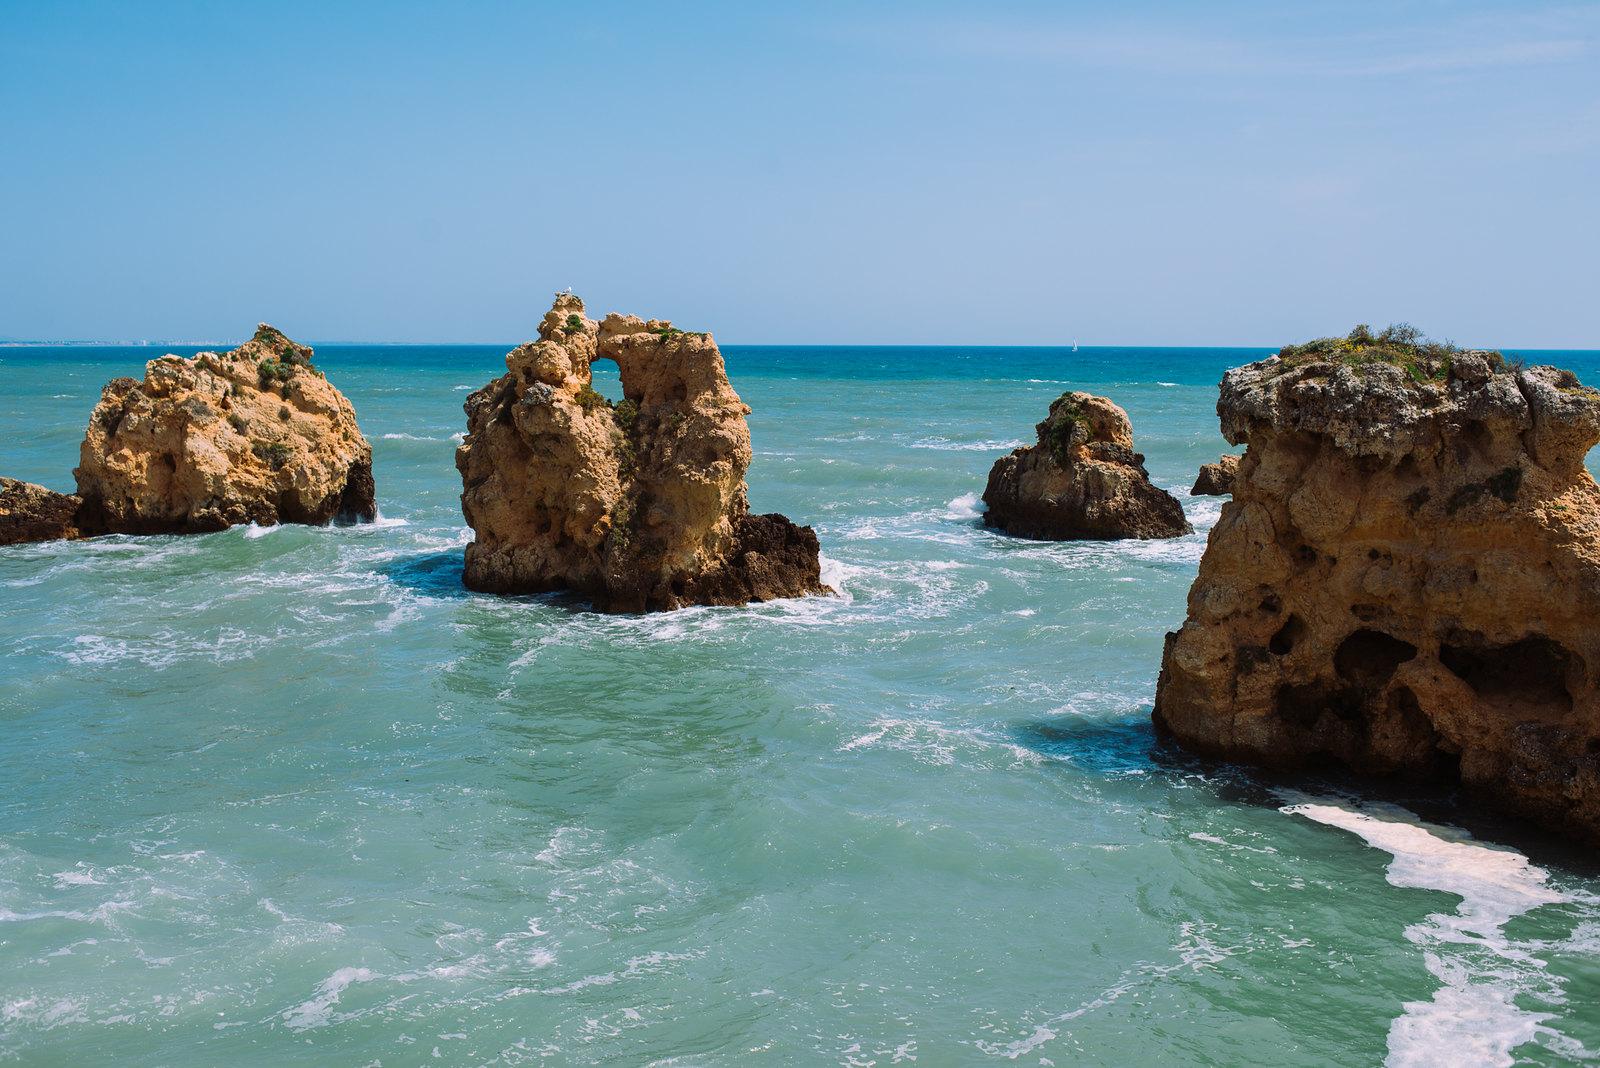 De Arrifes vagy Praia da Vigia strand Dél-Portugáliában